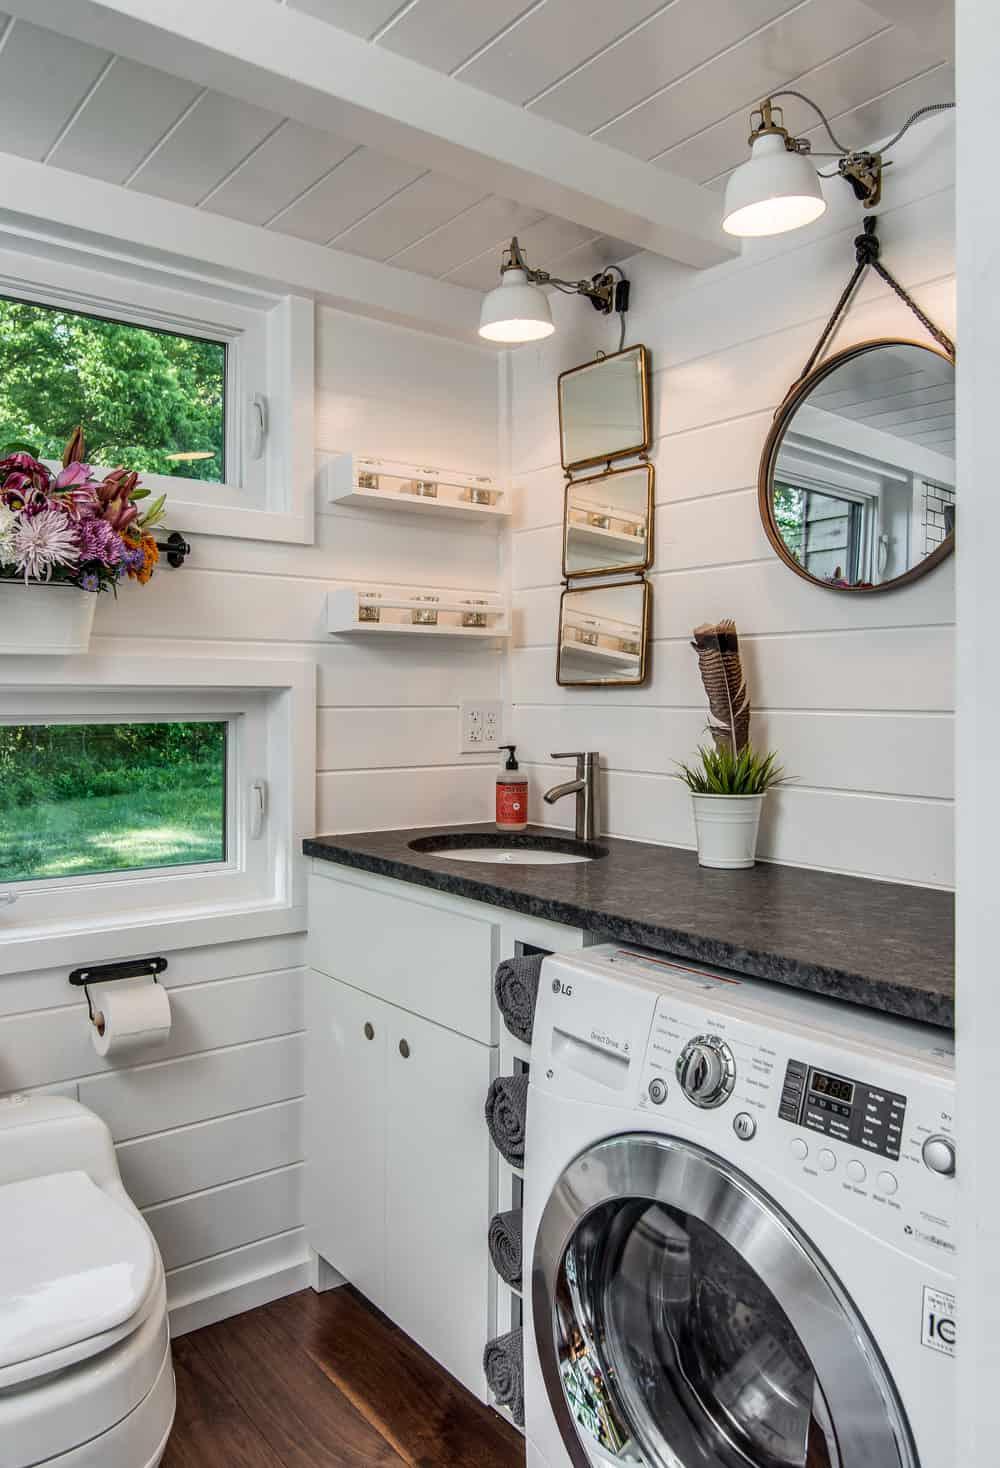 alpha-tiny-house-new-frontier-tiny-homes-30-1-kindesign